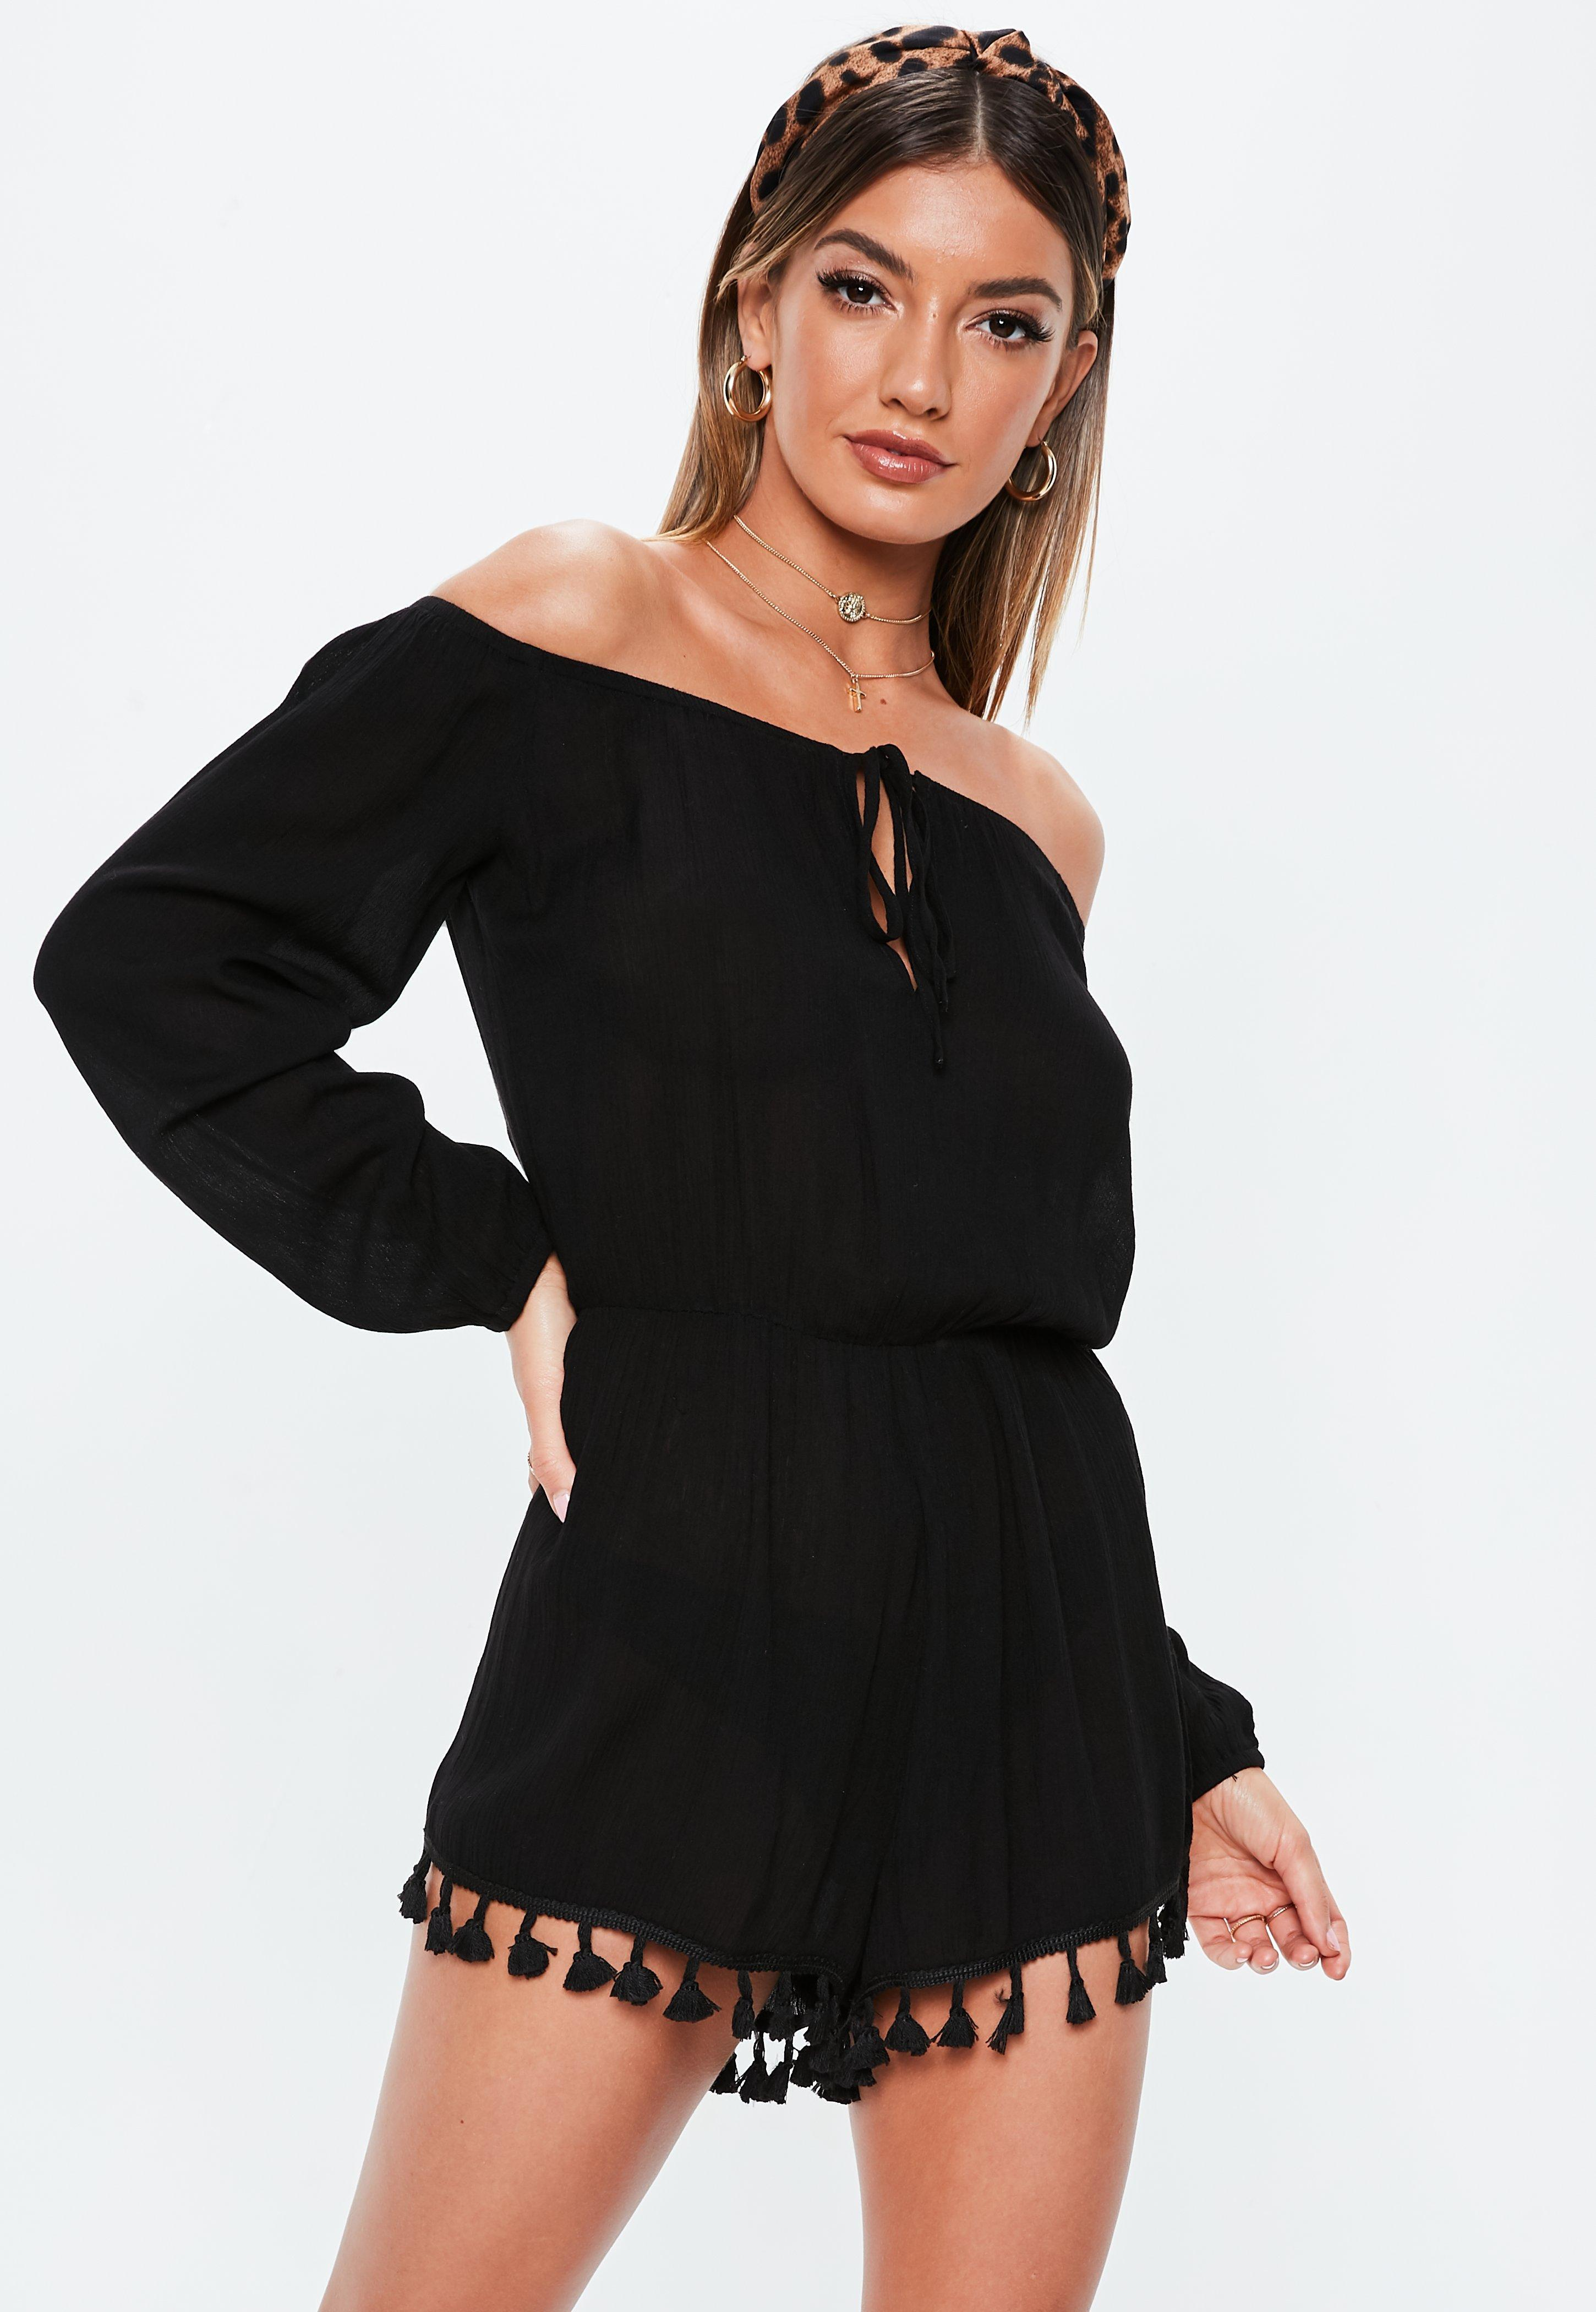 f97df272a81 Lyst - Missguided Black Bardot Tassel Trim Cover Up Playsuit in Black